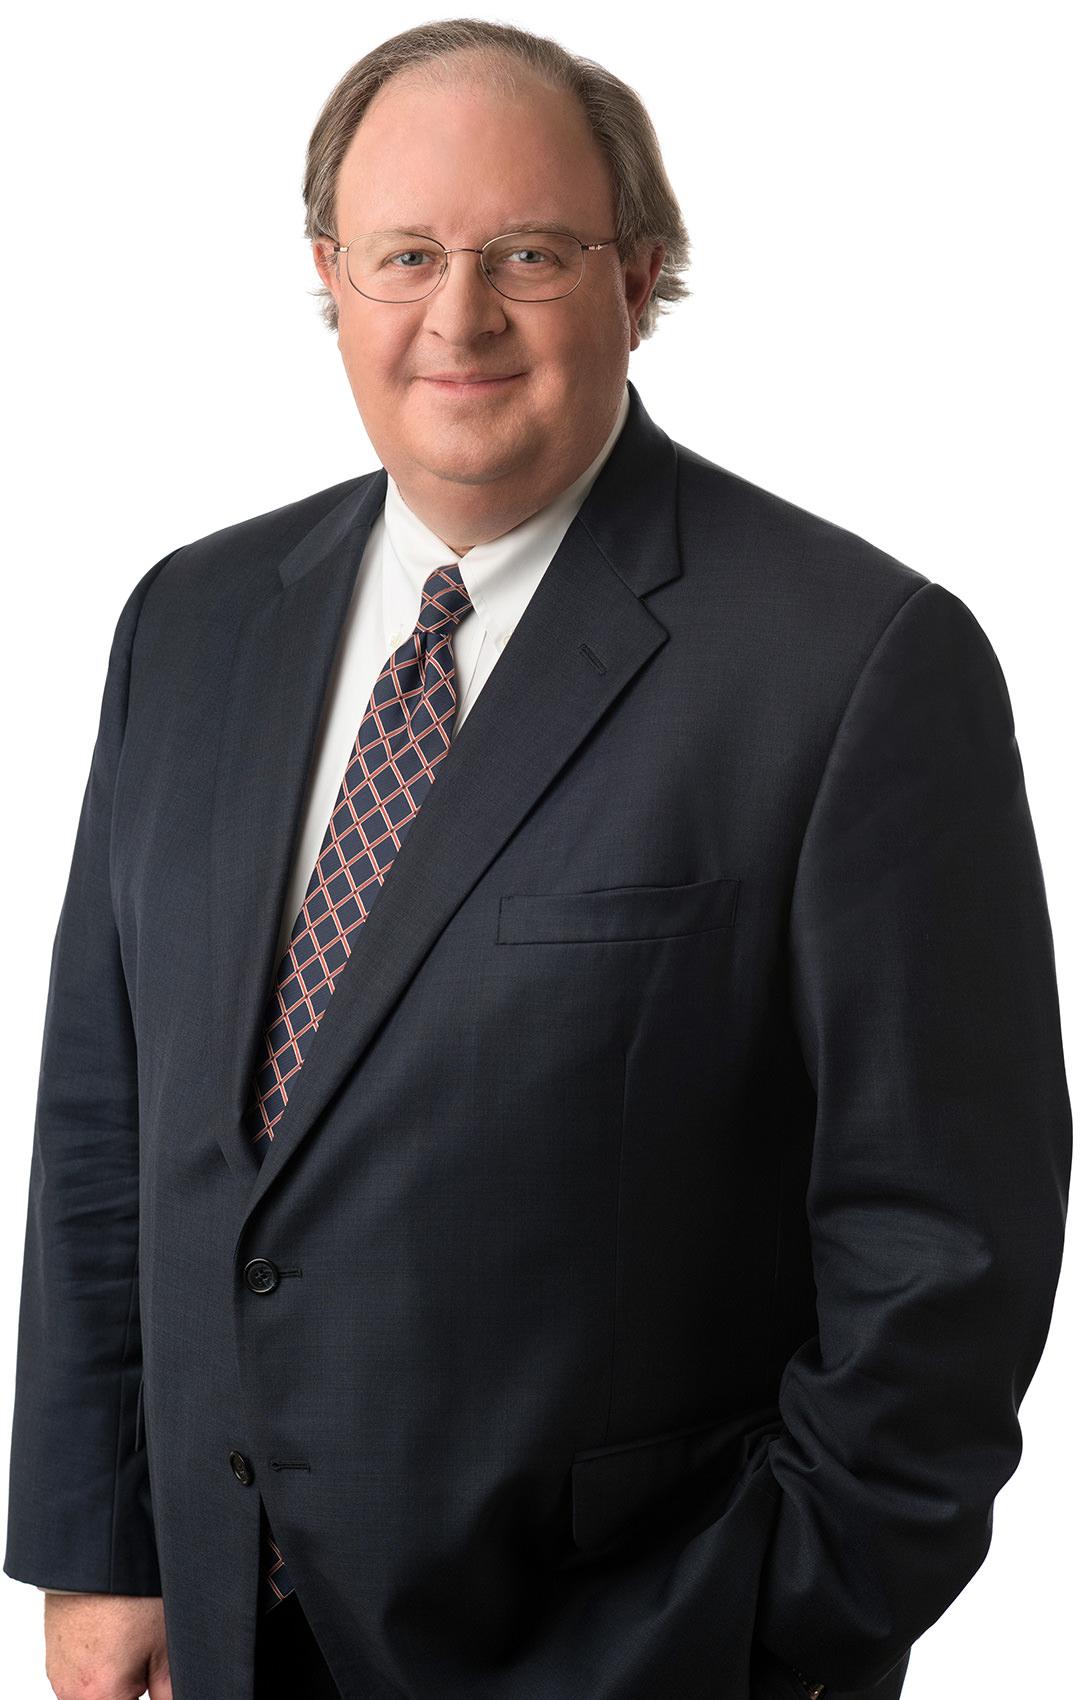 Mark C. Dukes